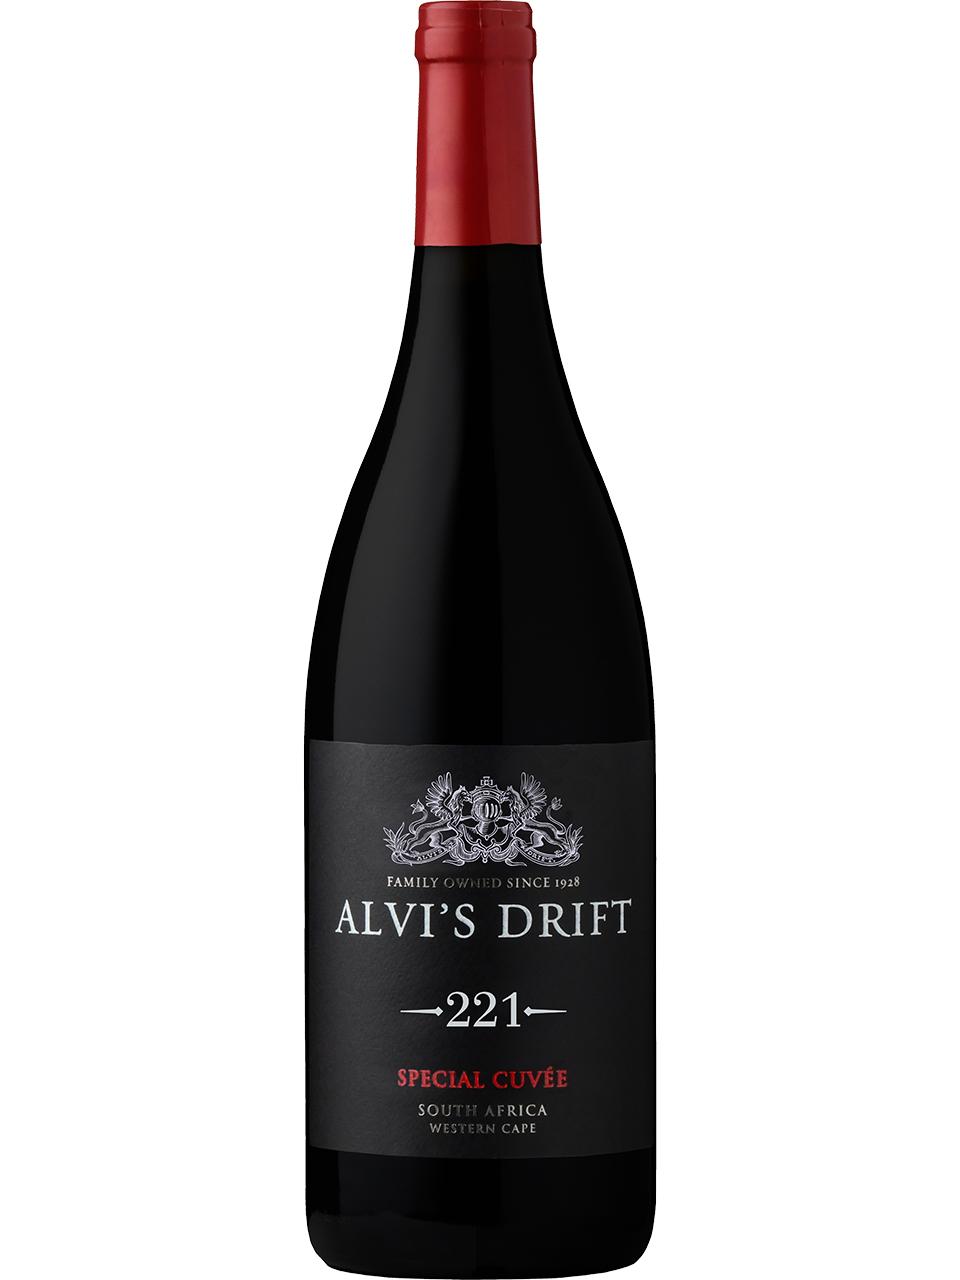 Alvi's Drift 221 Special Cuvee